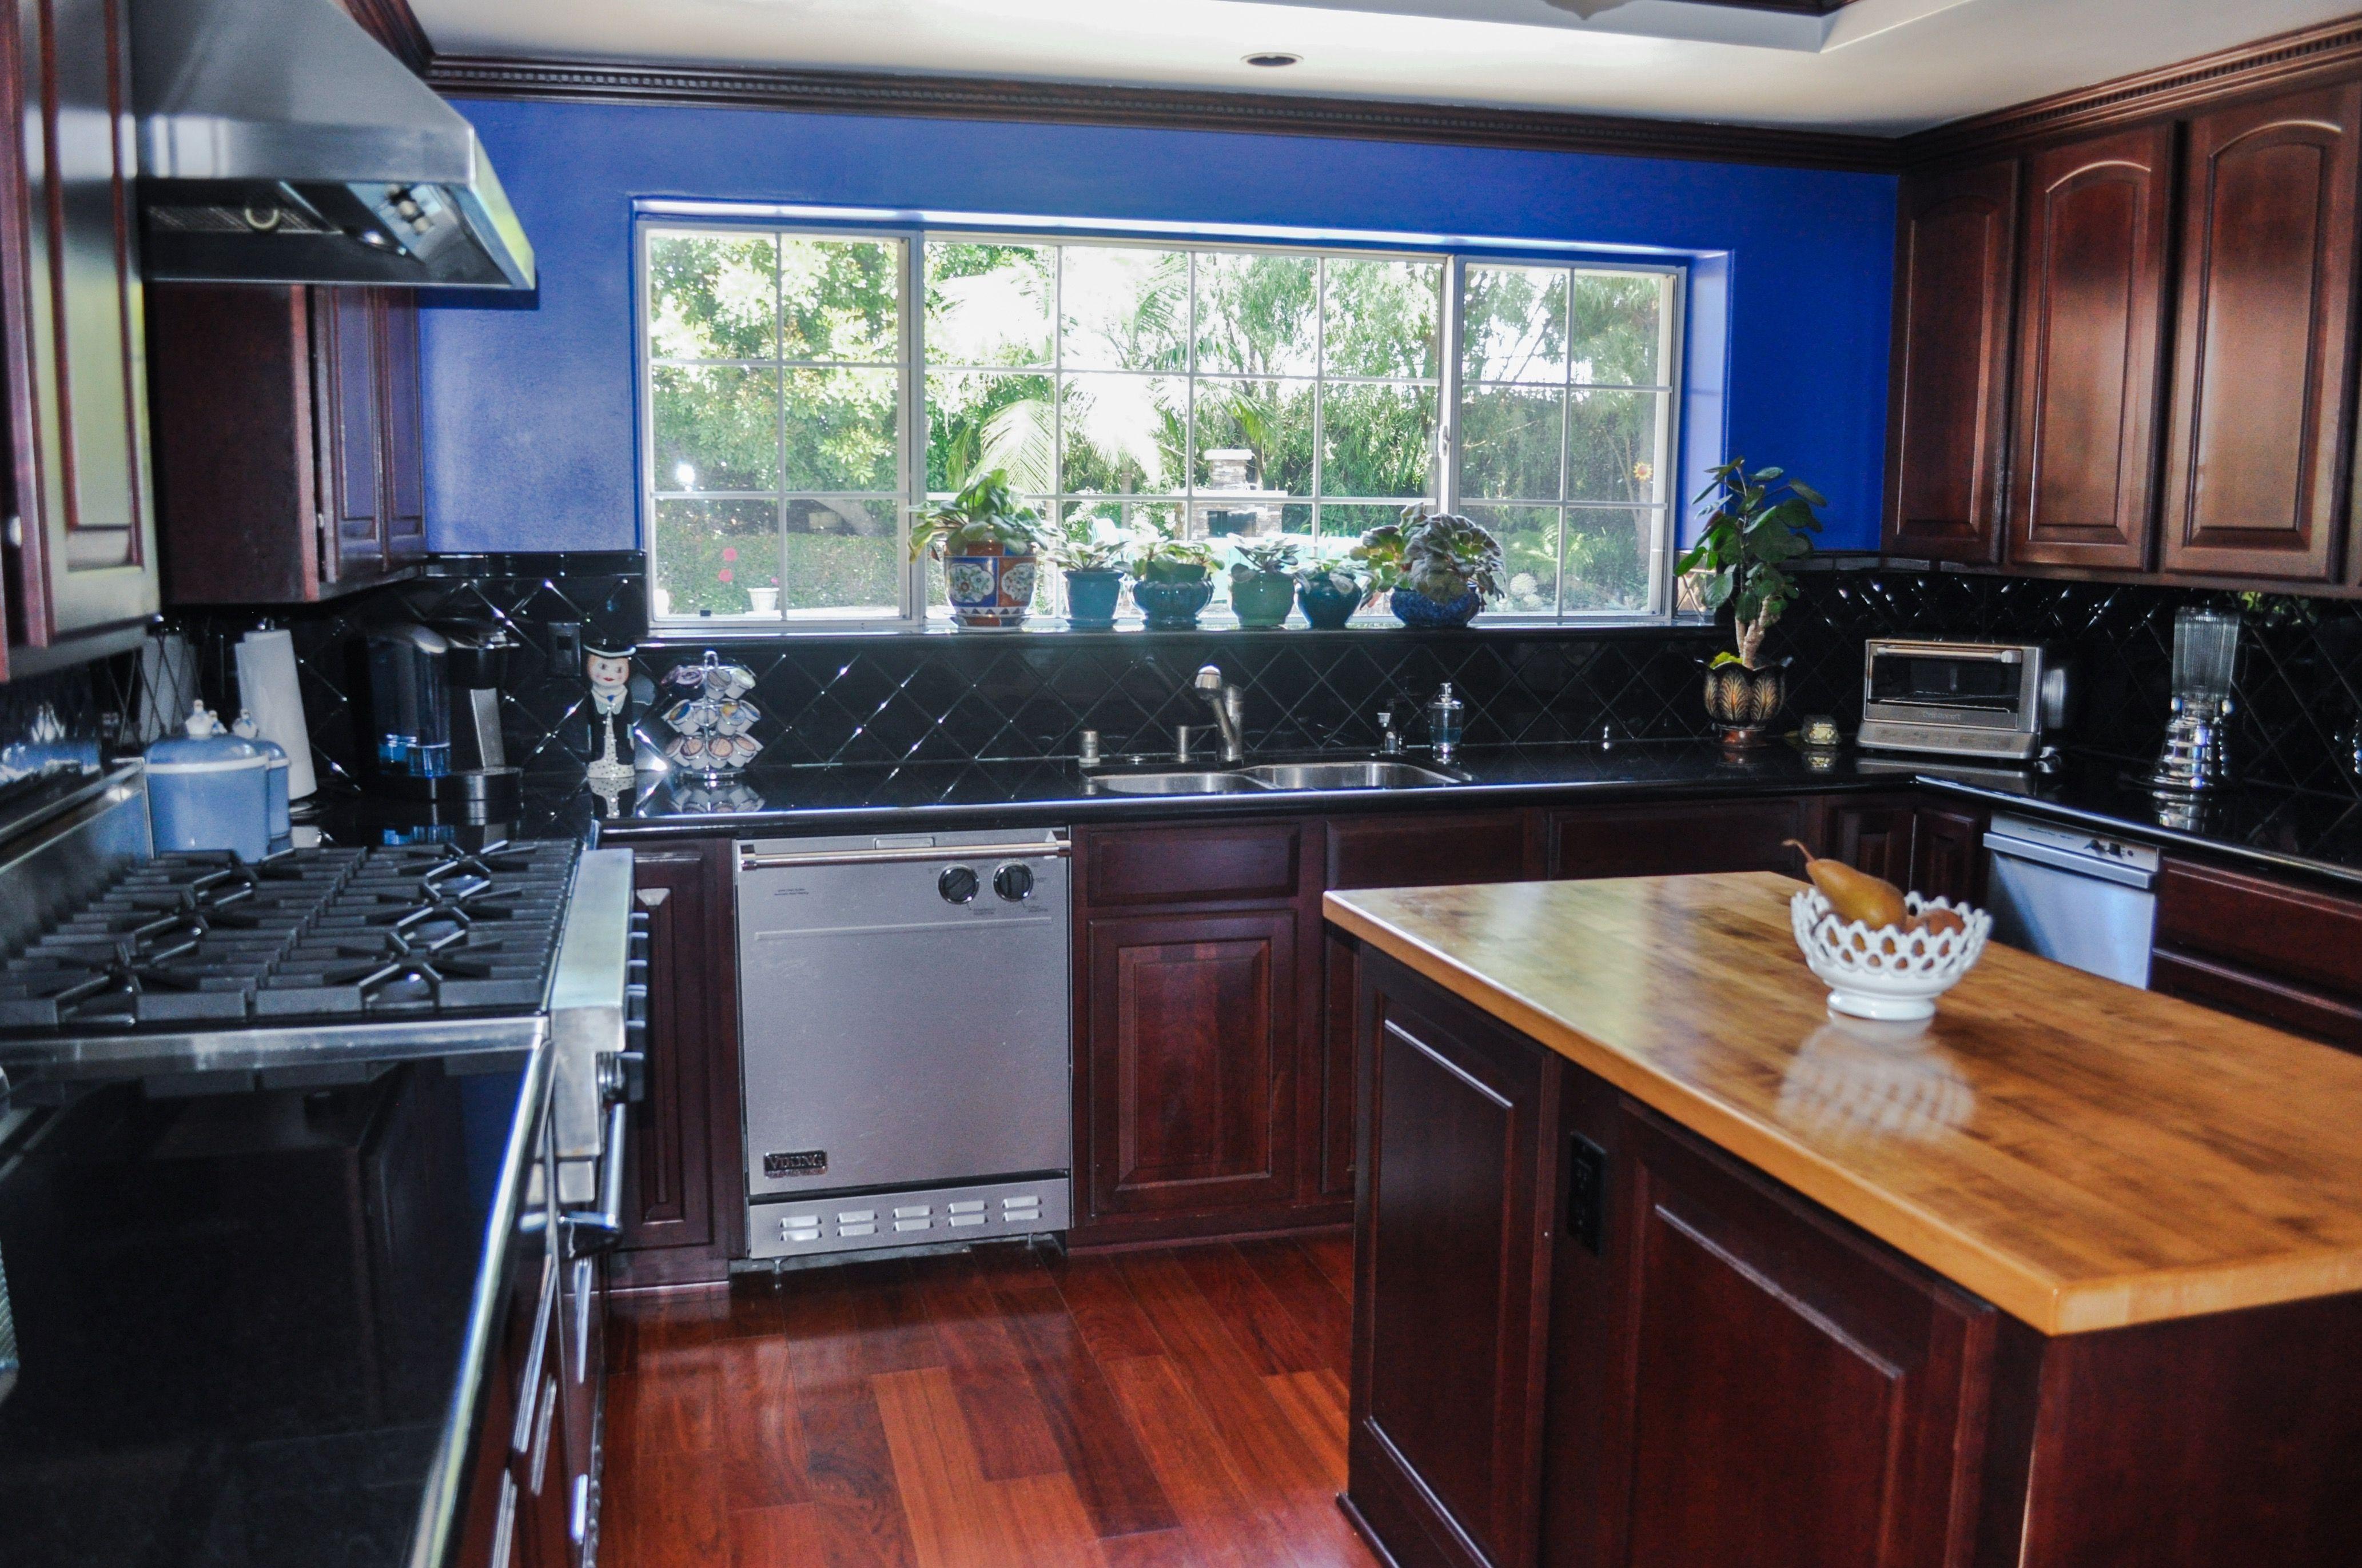 Kitchen Remodeling After Water Damage!!! Got Water Damage ...